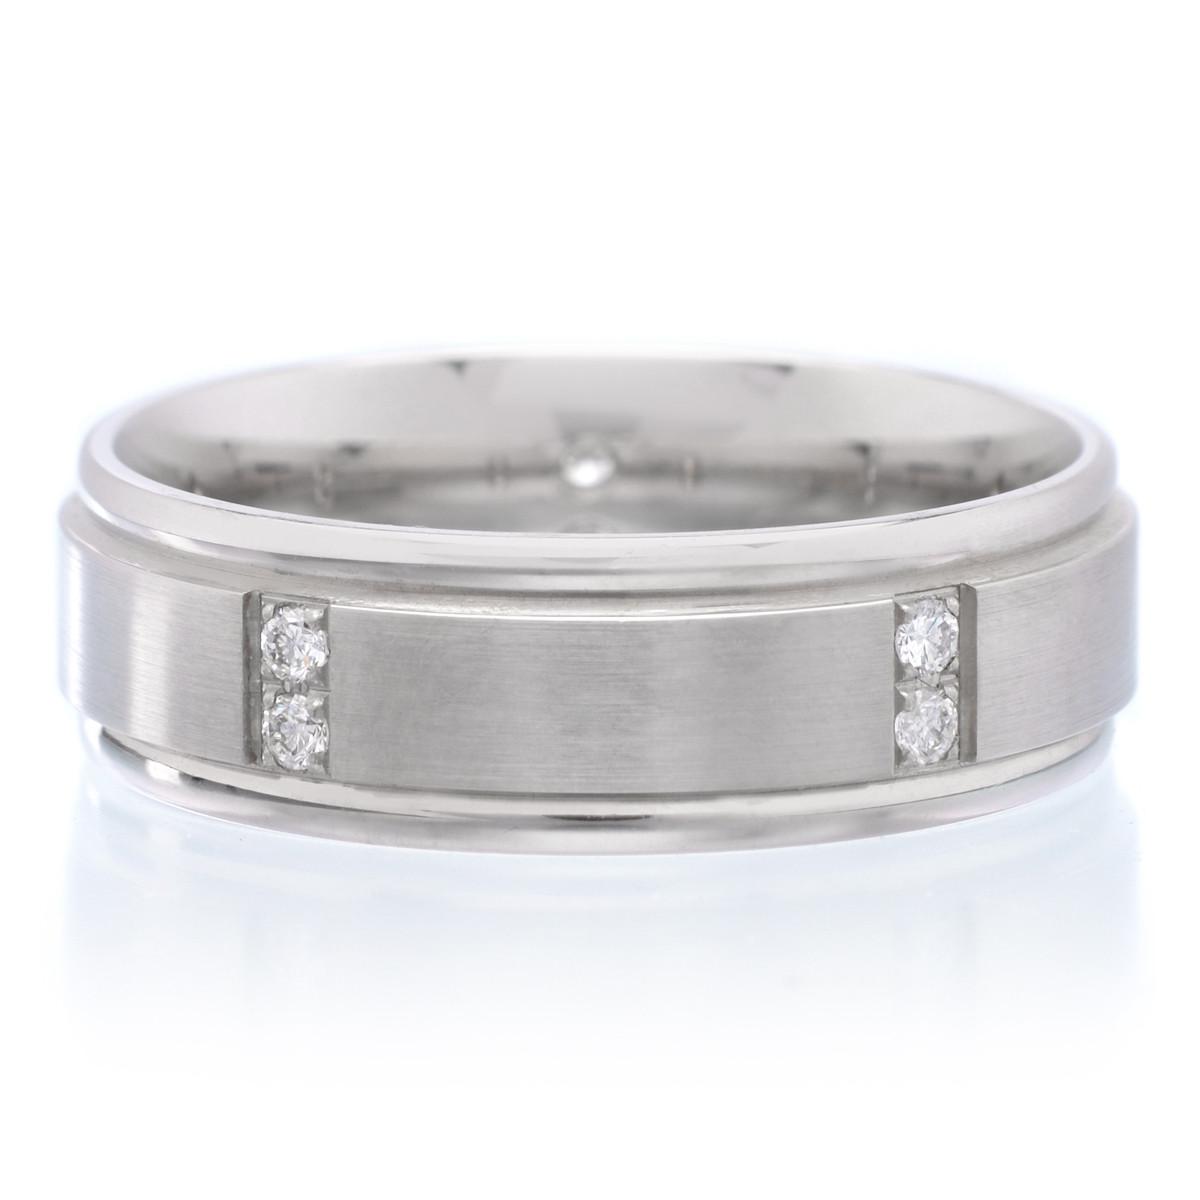 Ritani palladium 7mm satin finish band with diamonds